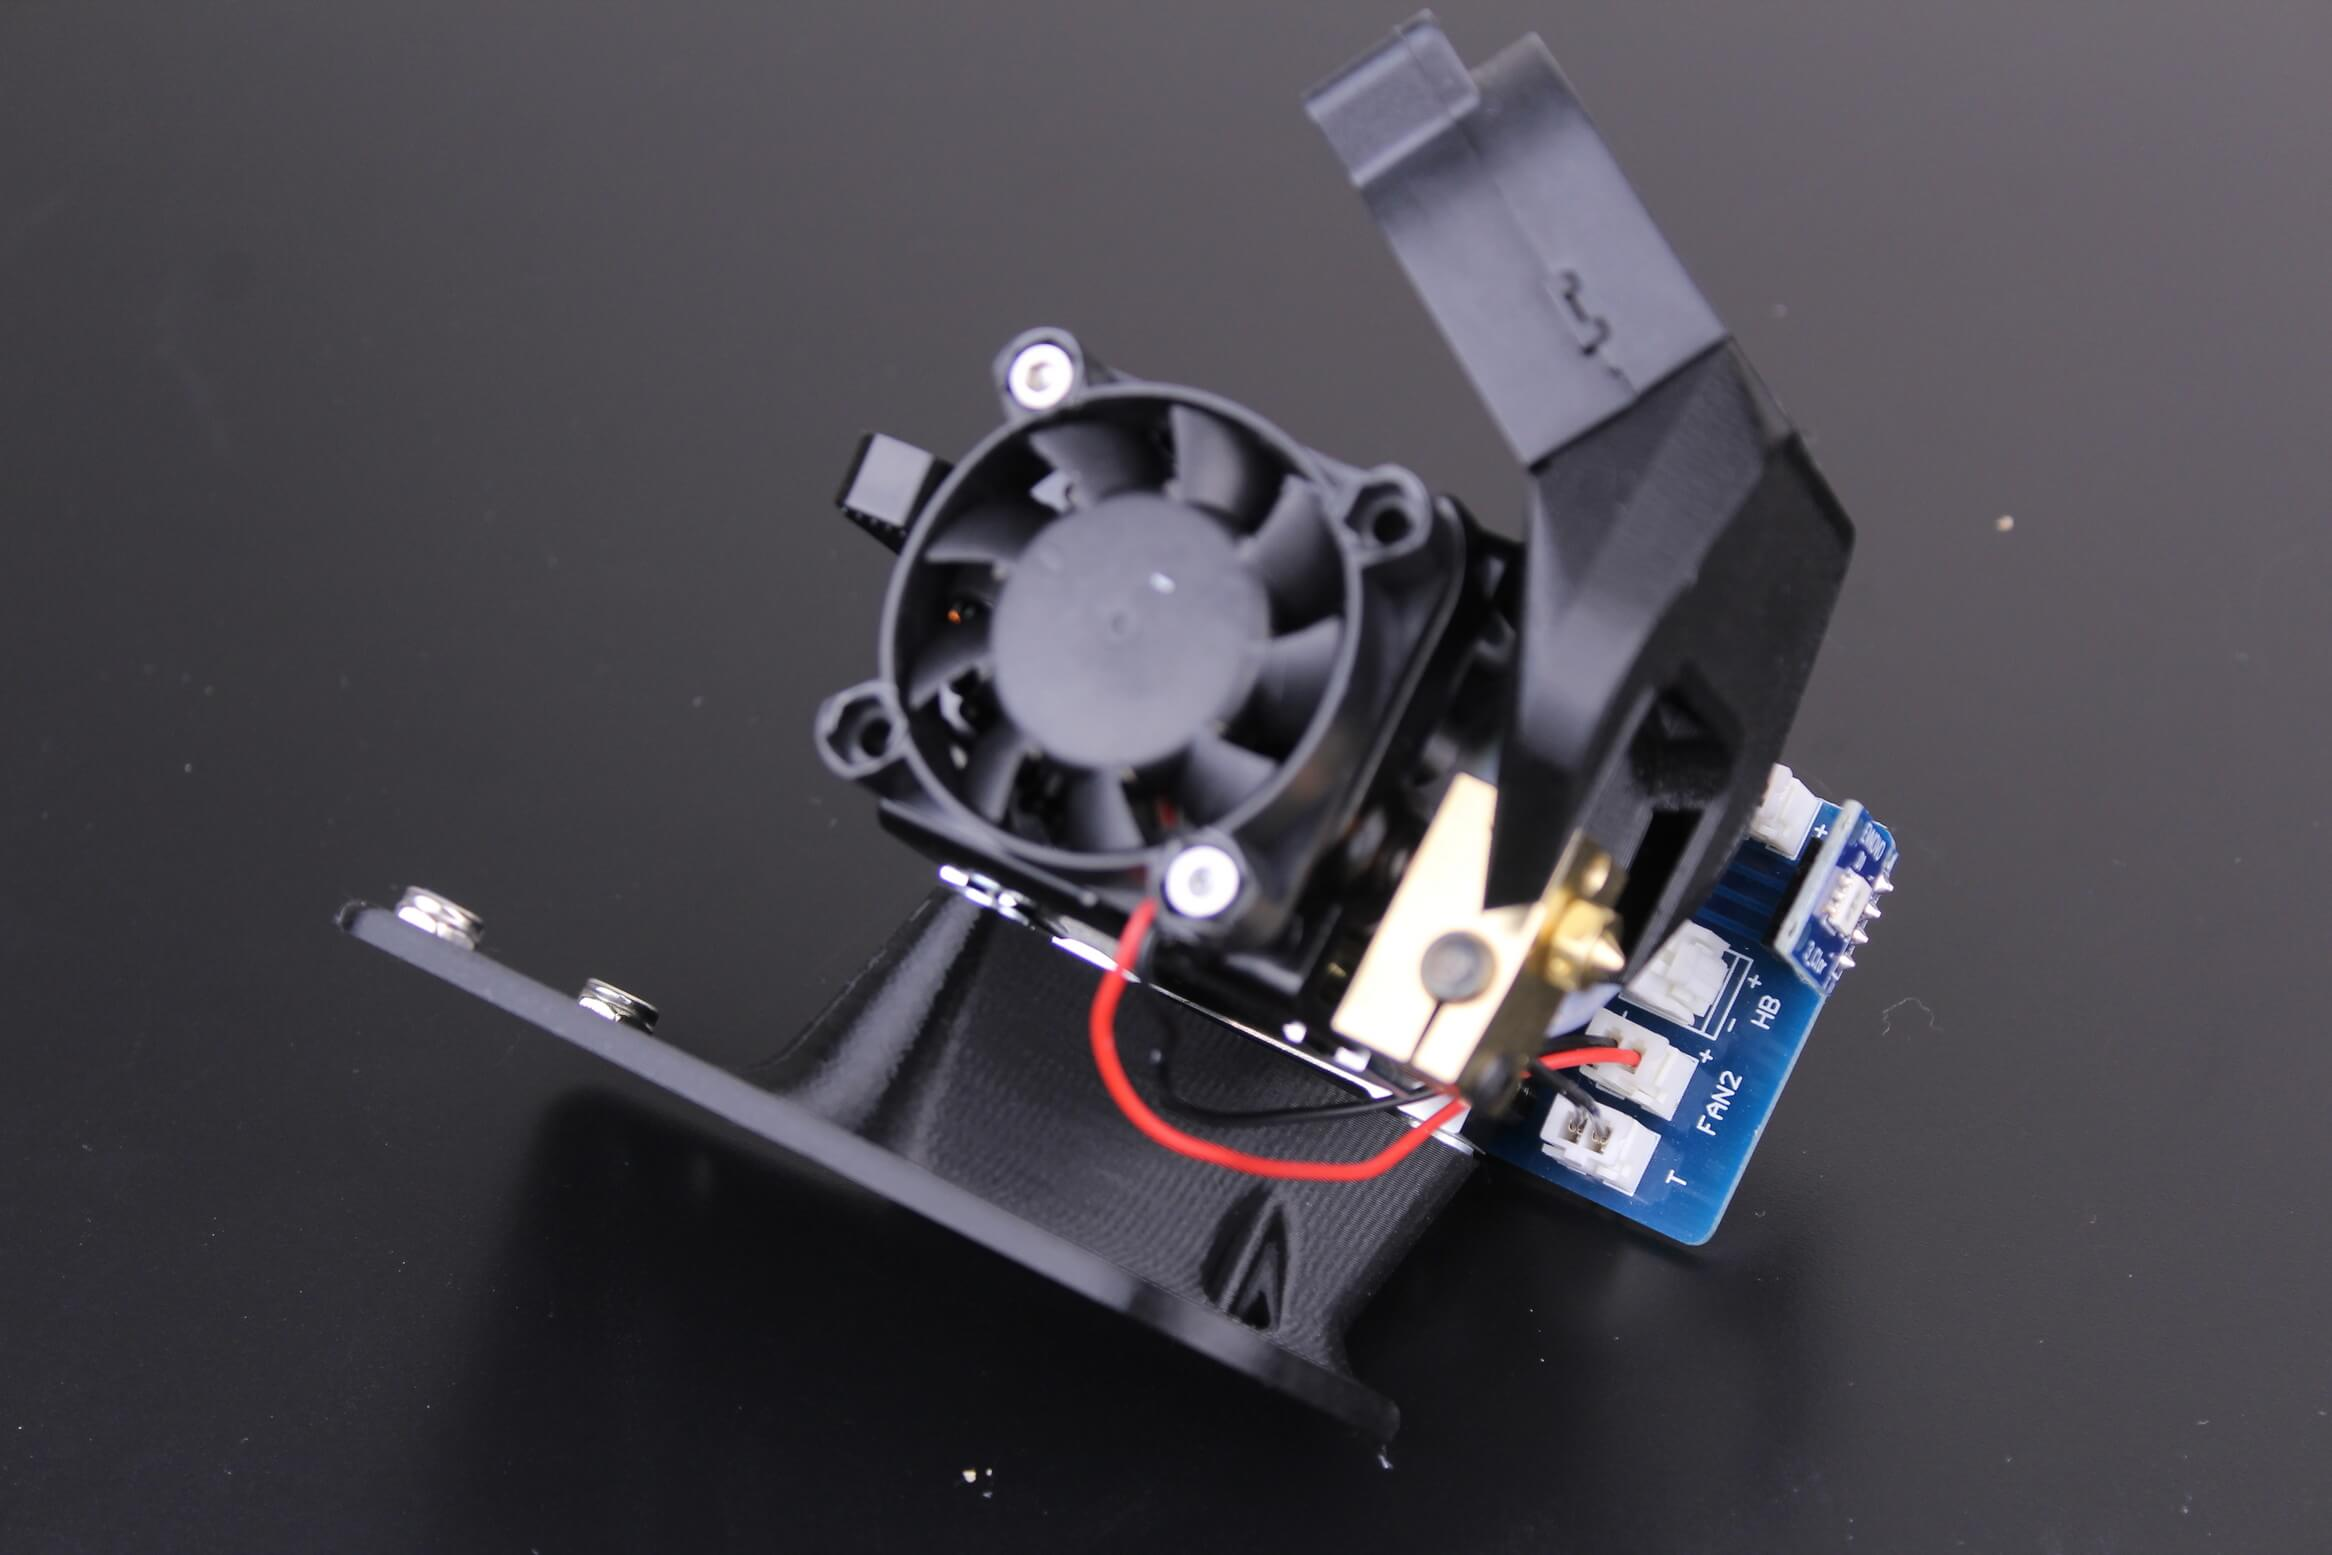 Trianglelab-Matrix-Extruder-assembled-for-the-Artillery-3D-printer-1